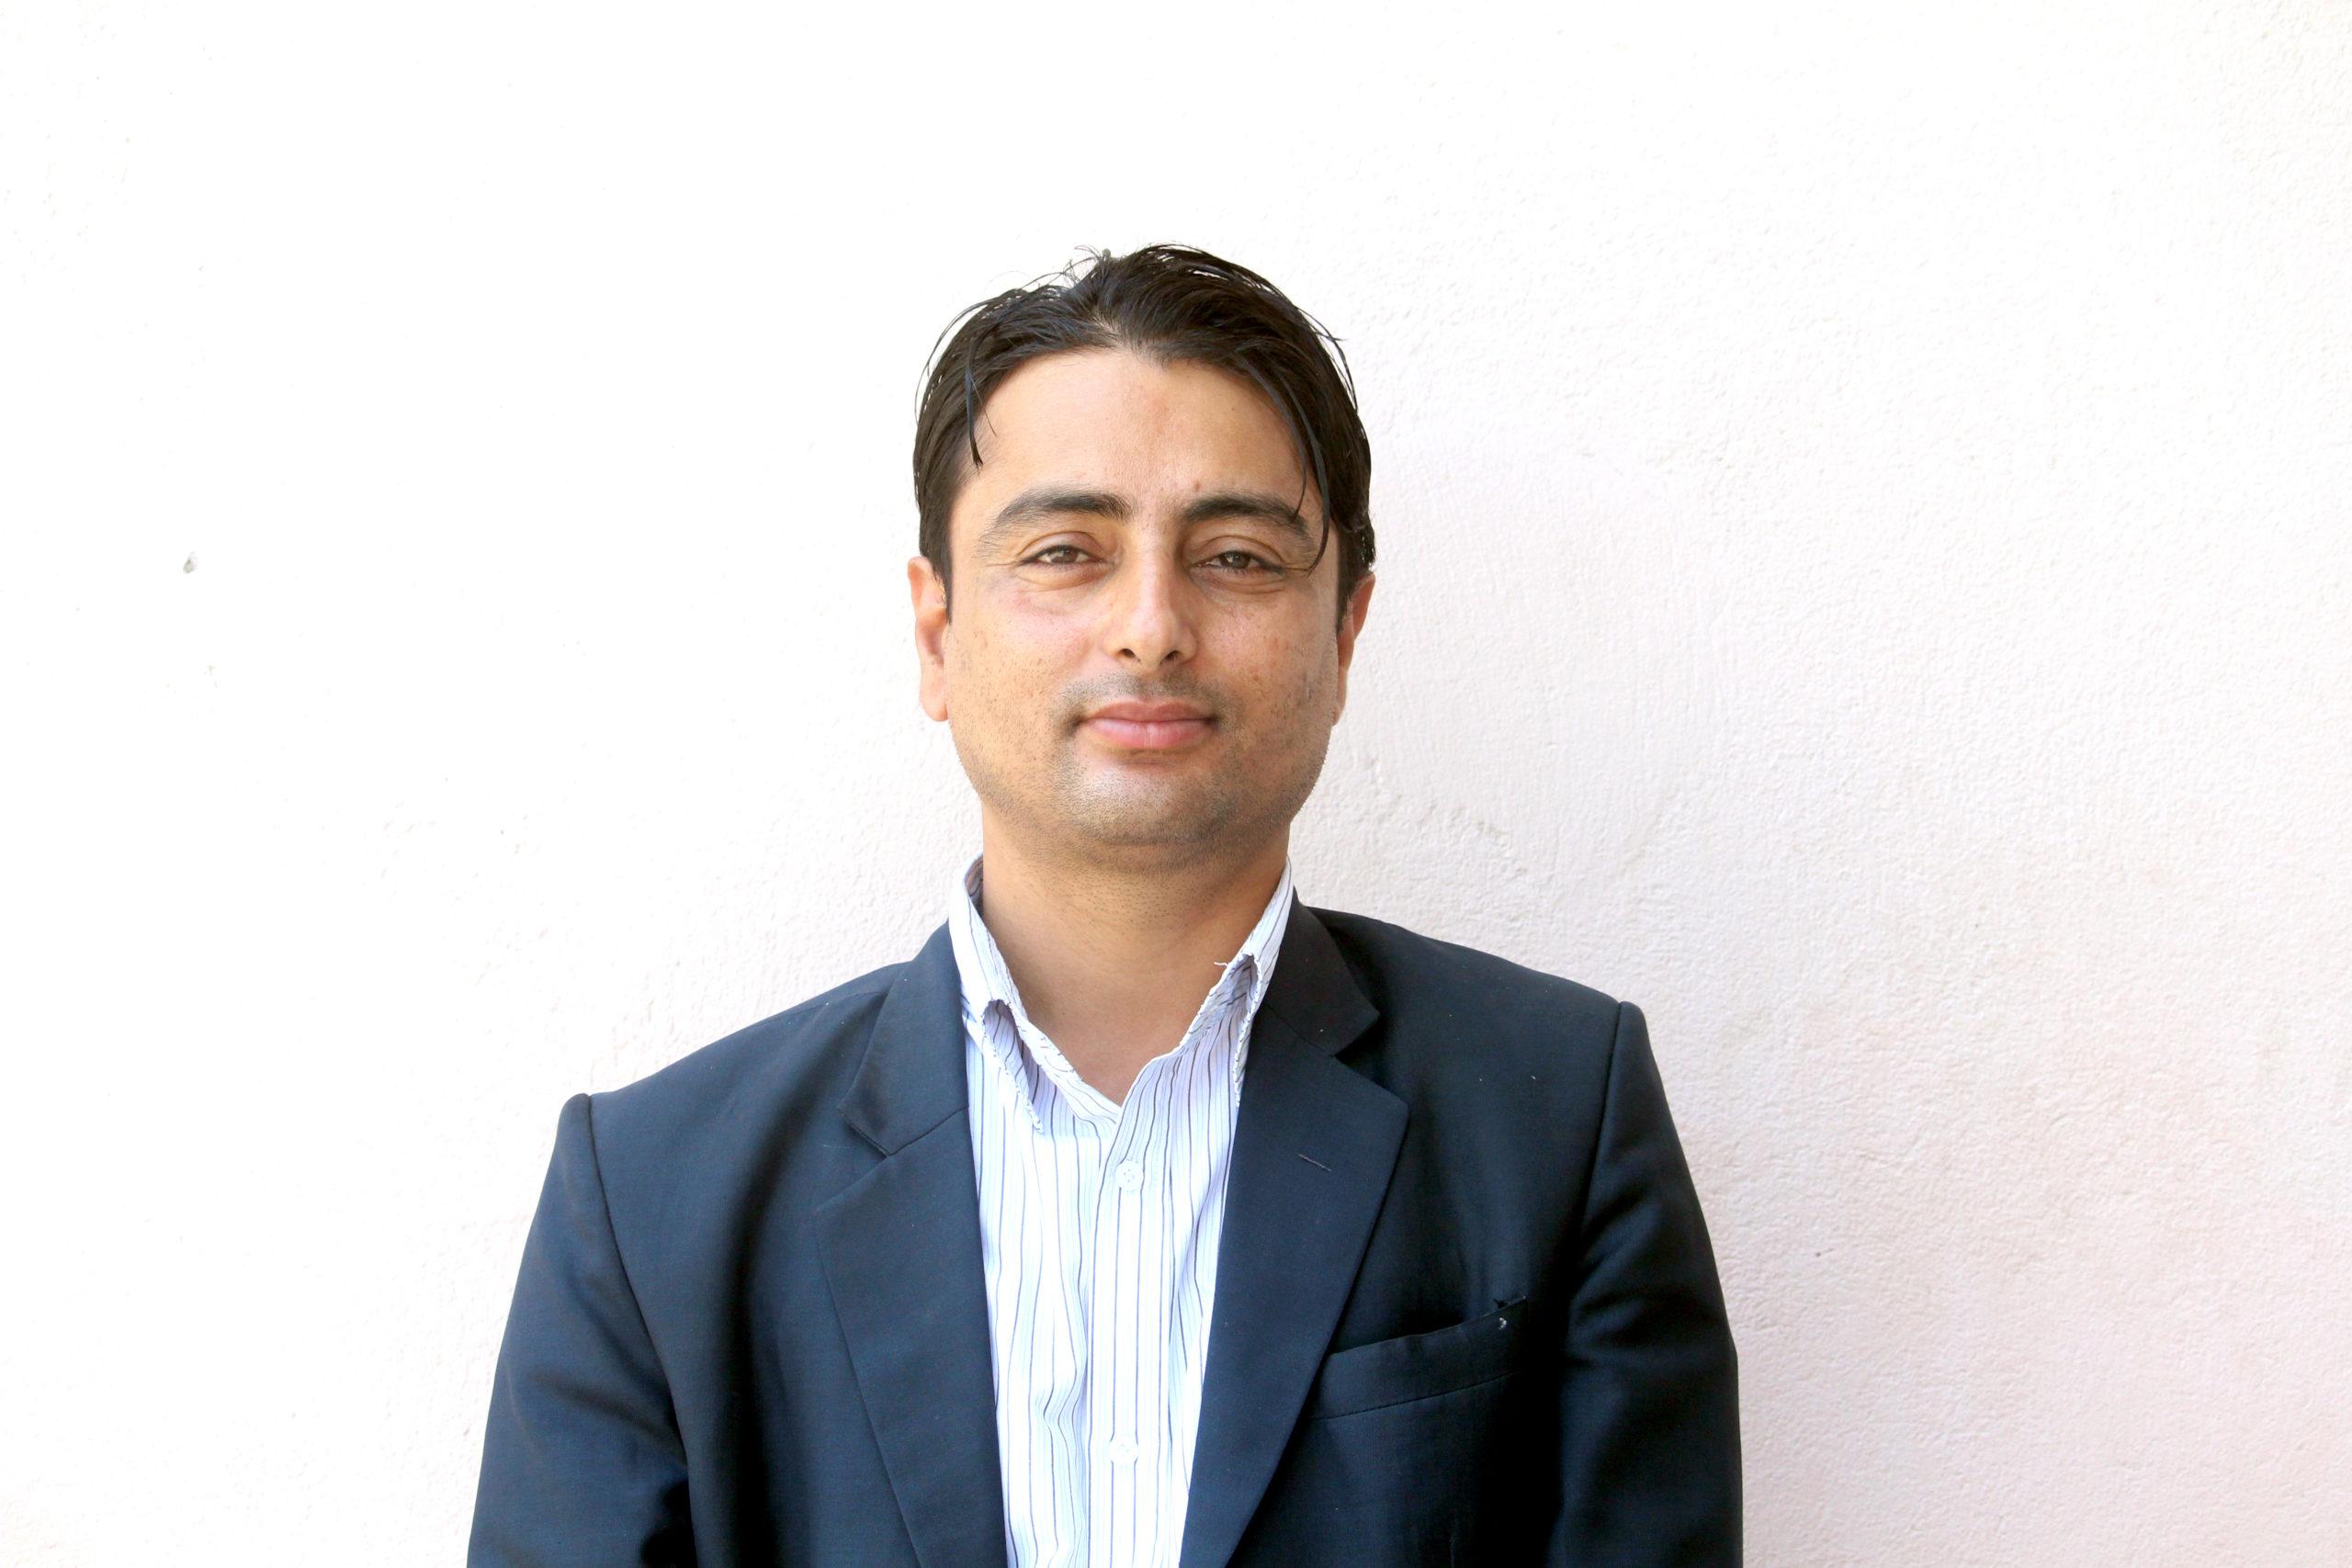 Khila Devkota